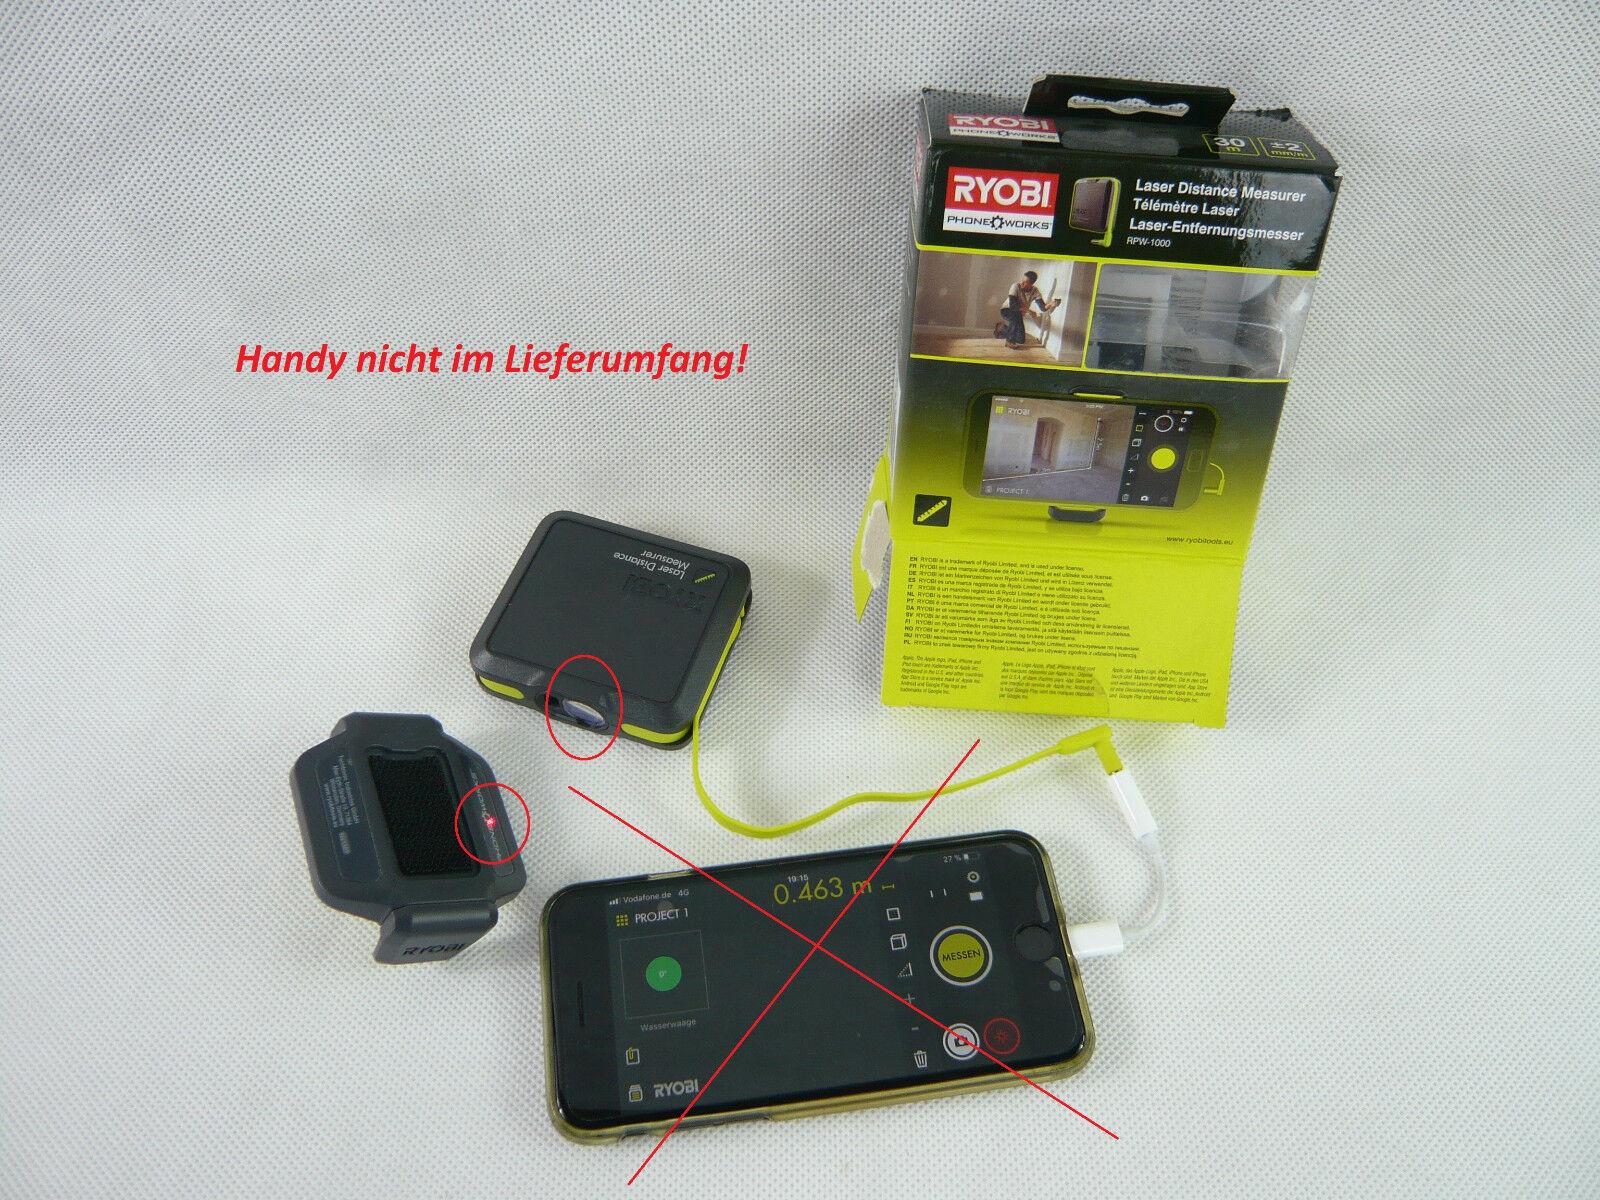 Infrarot Laser Entfernungsmesser : Ryobi phone works laser entfernungsmesser rpw